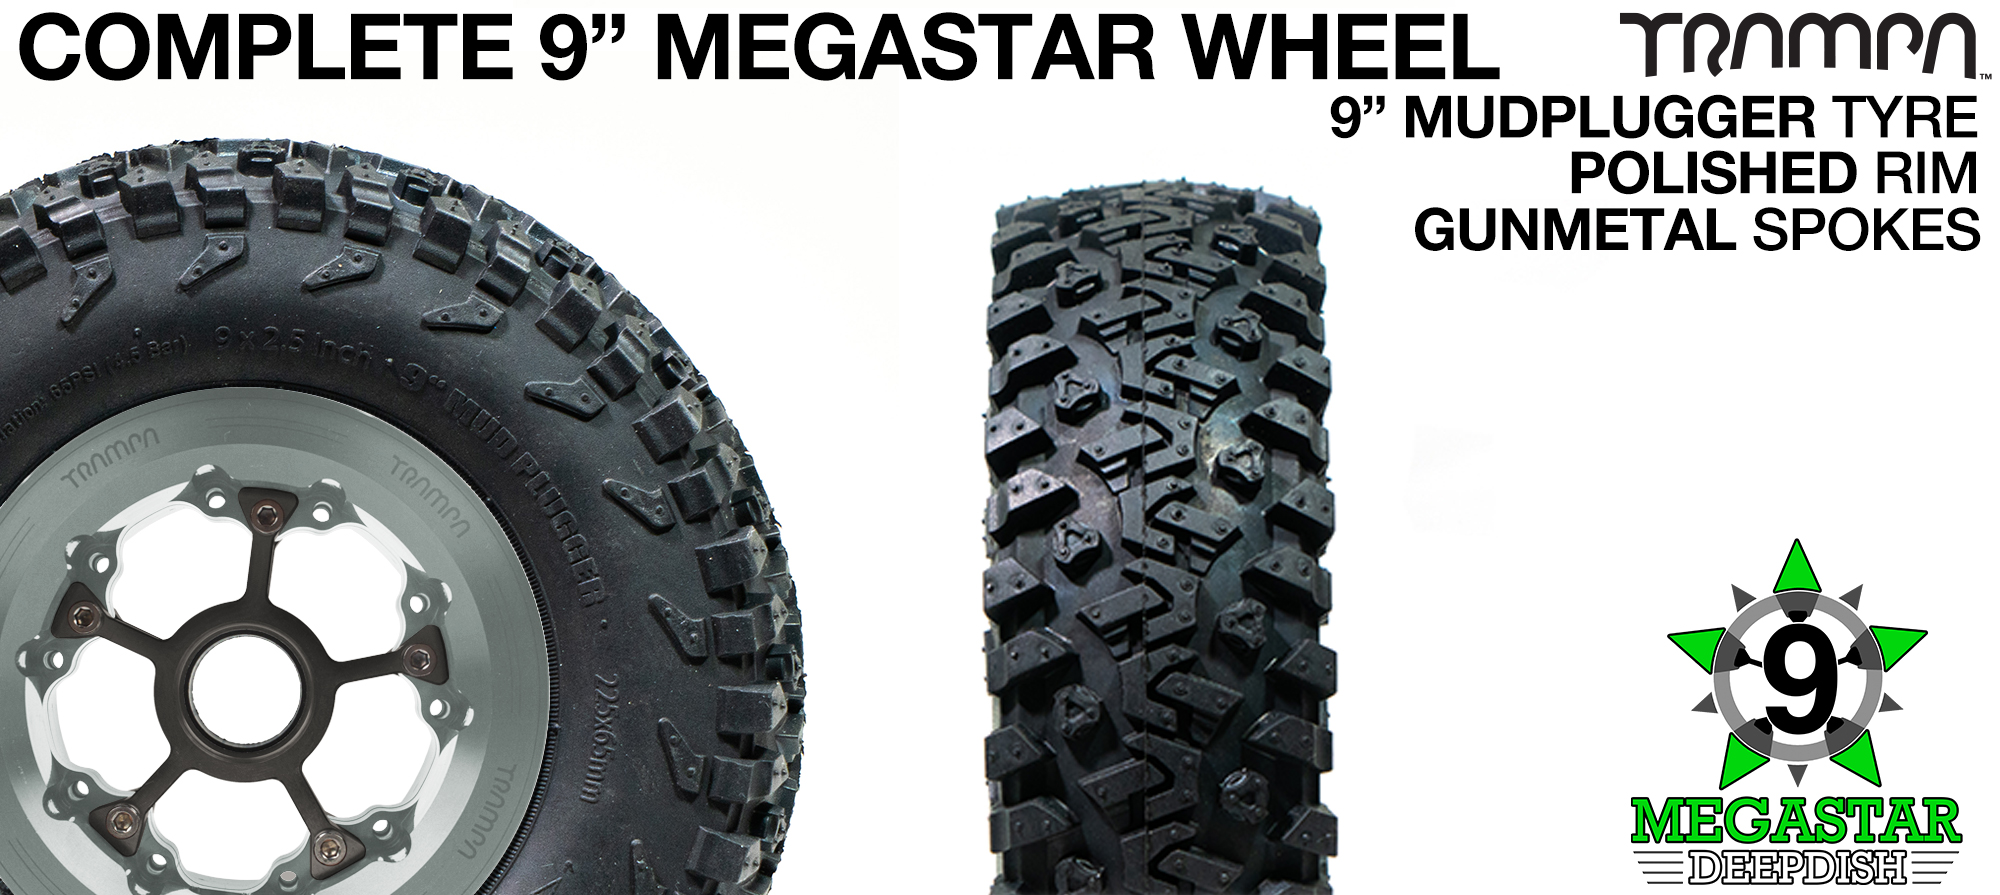 POLISHED 9 inch Deep-Dish MEGASTARS Rim with GUNMETAL Spokes & 9 Inch MUDPLUGGER Tyre